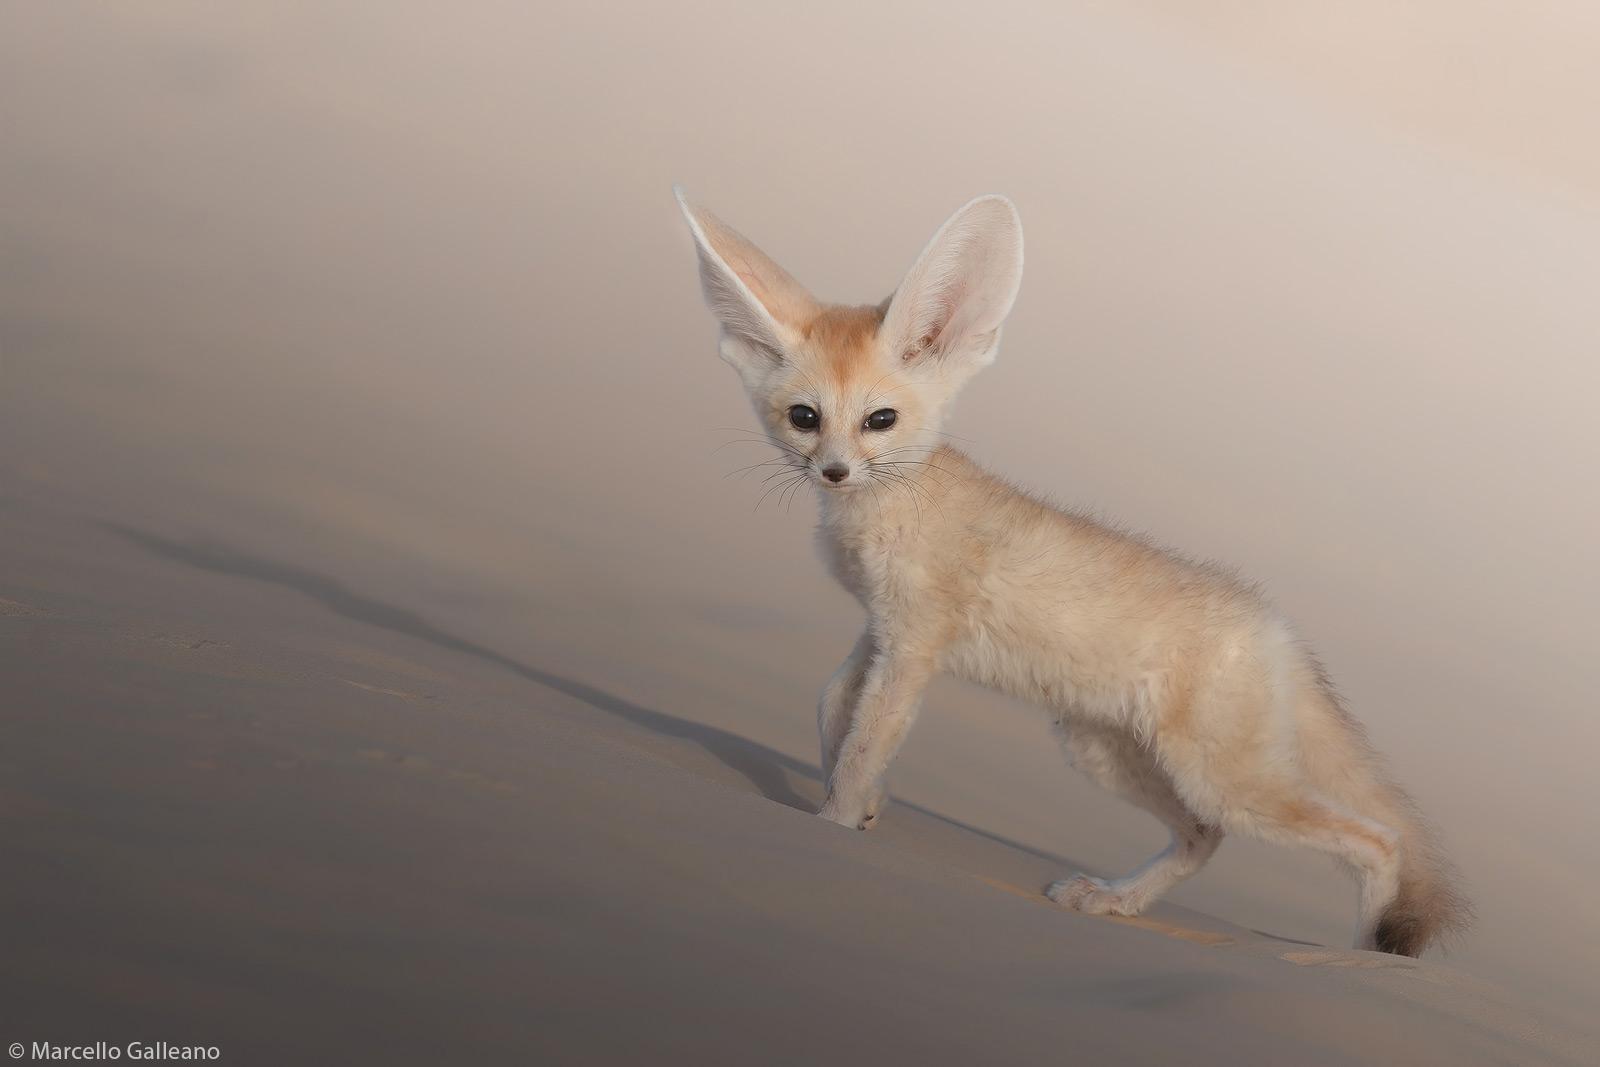 Marcello-Galleano-fennec-fox-Tunisian-desert-1.jpg